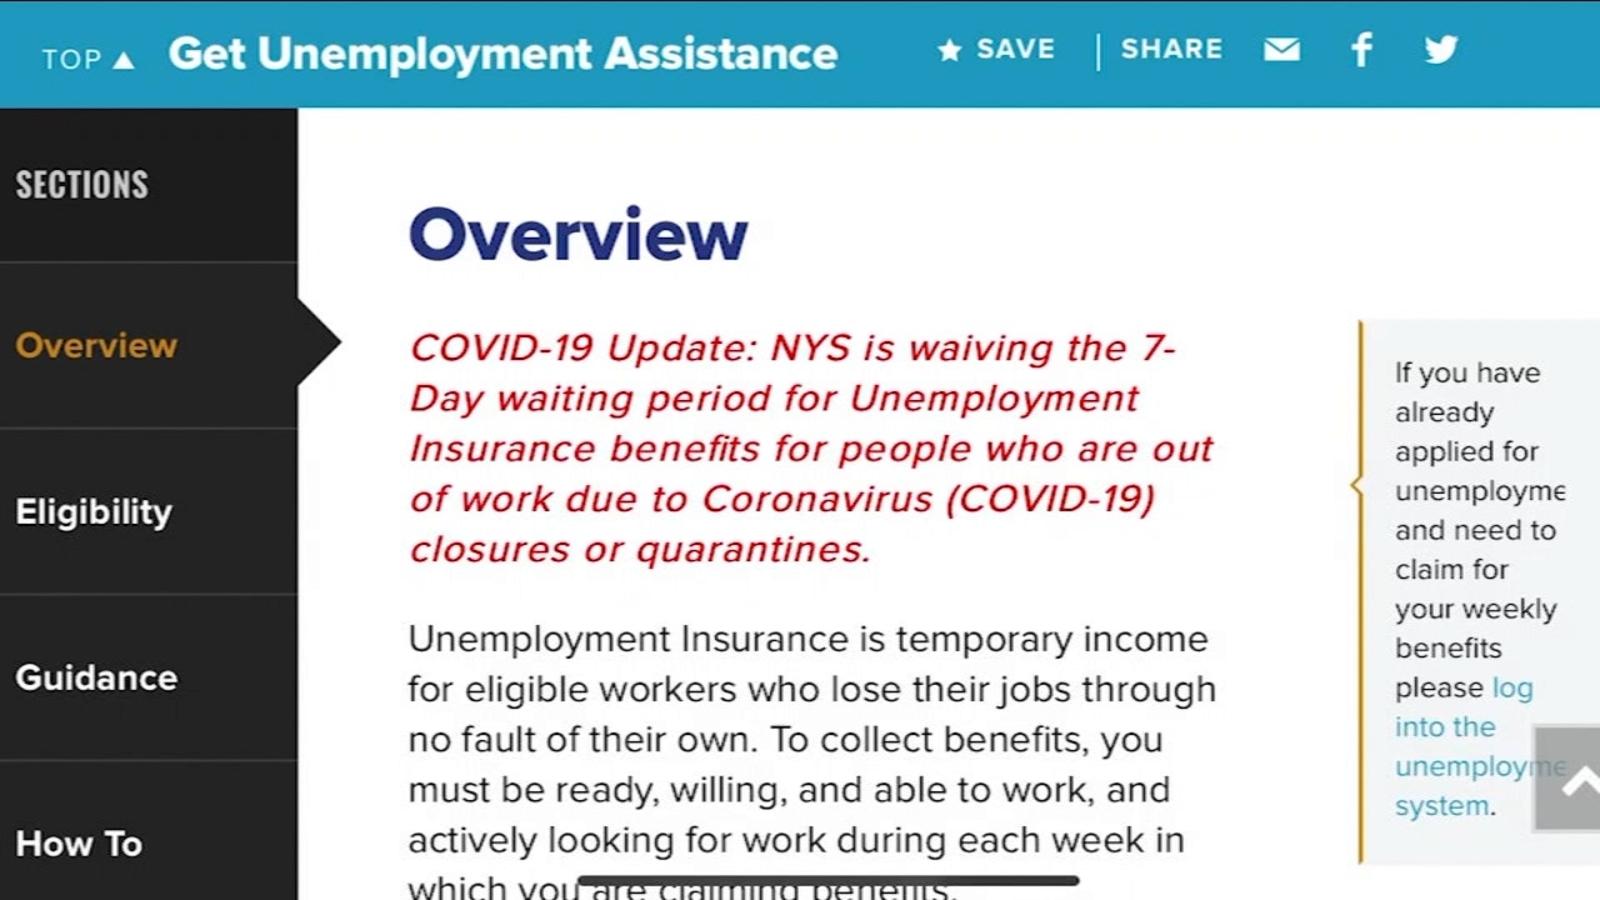 Coronavirus New York: NY reboots unemployment site to improve process -  ABC7 New York